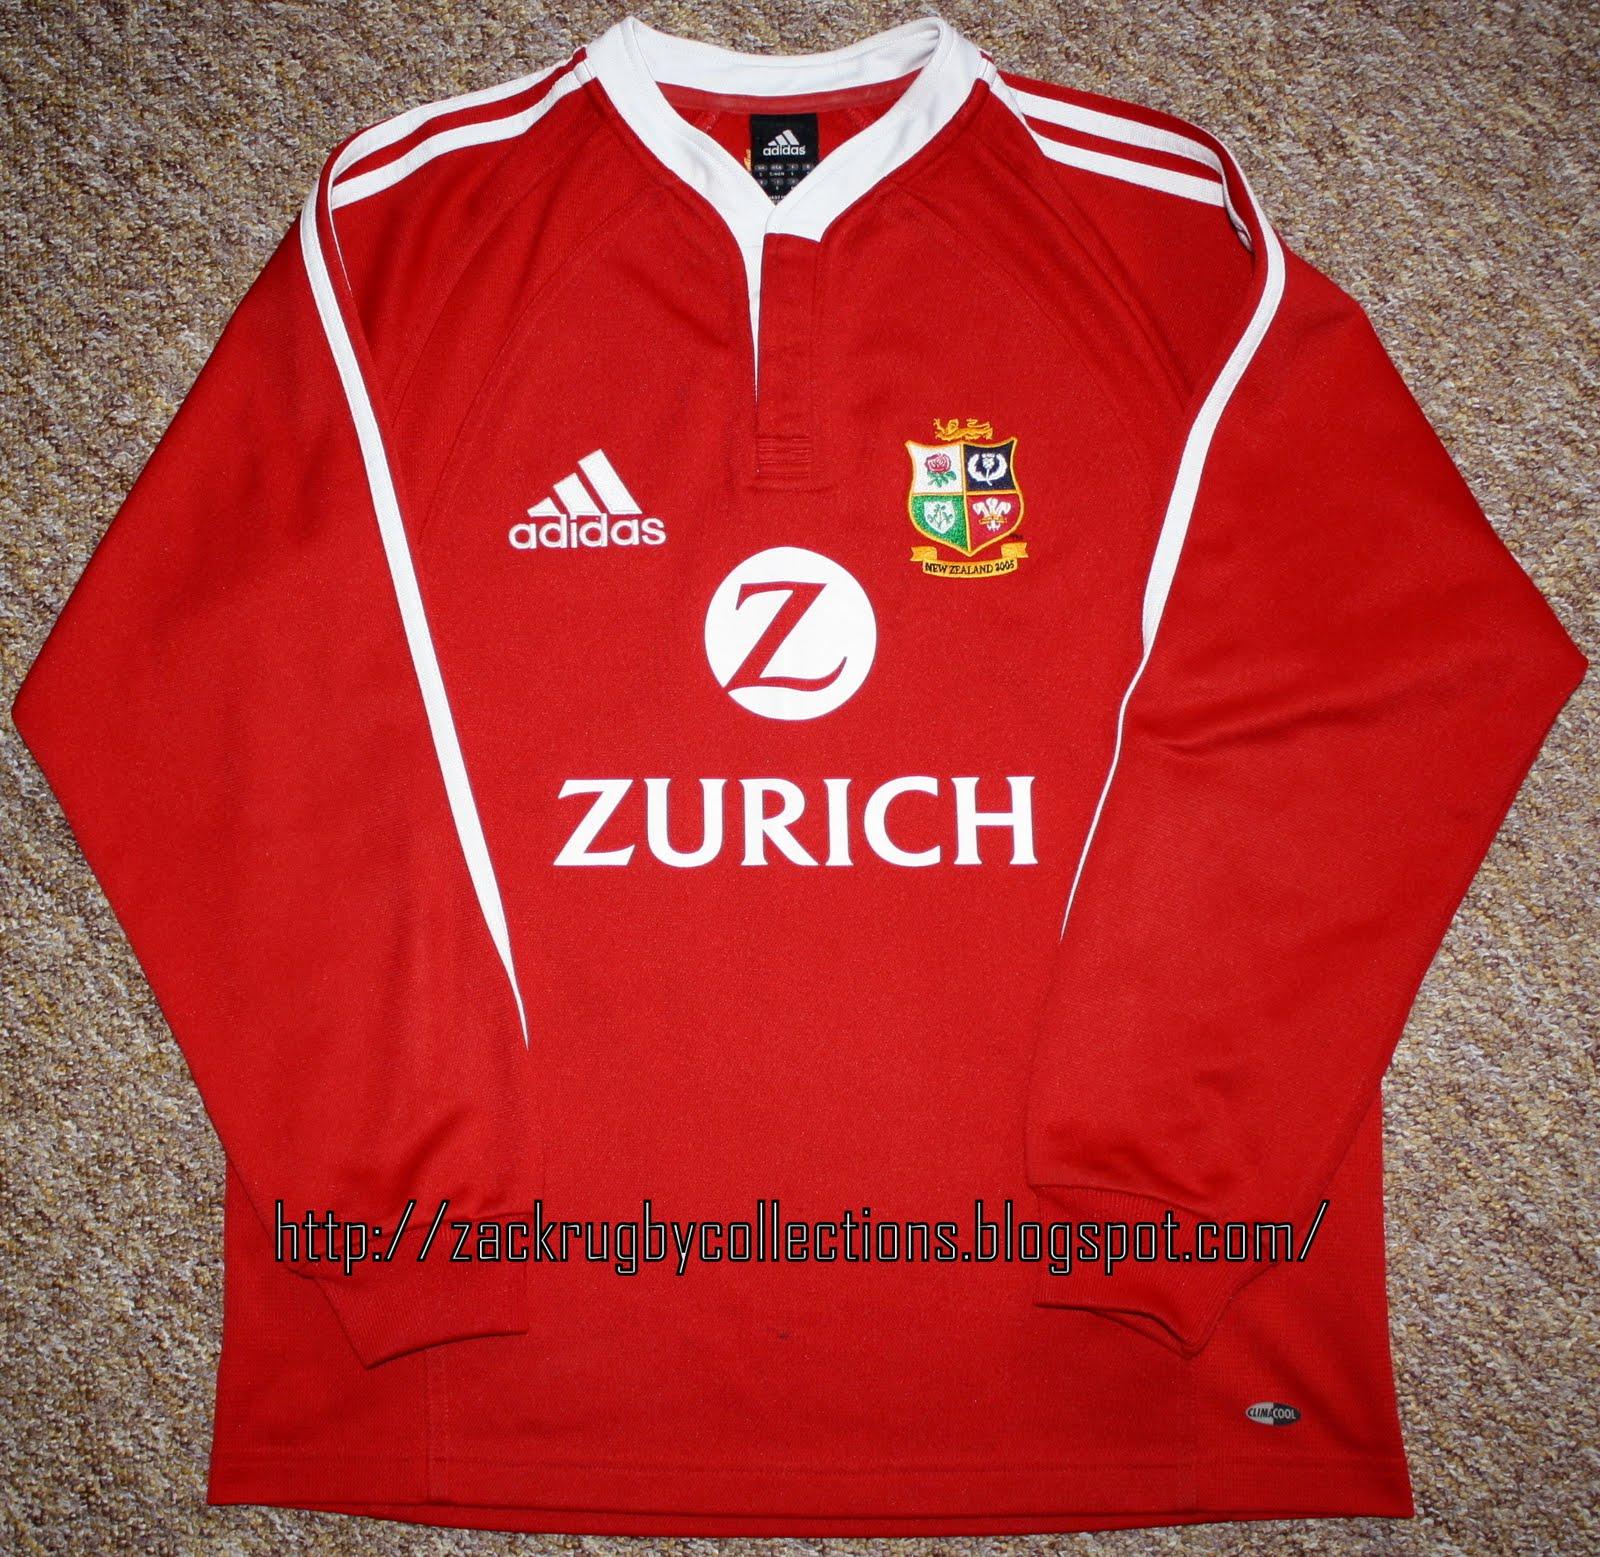 Chùm ảnh: Zurich jersey (13)